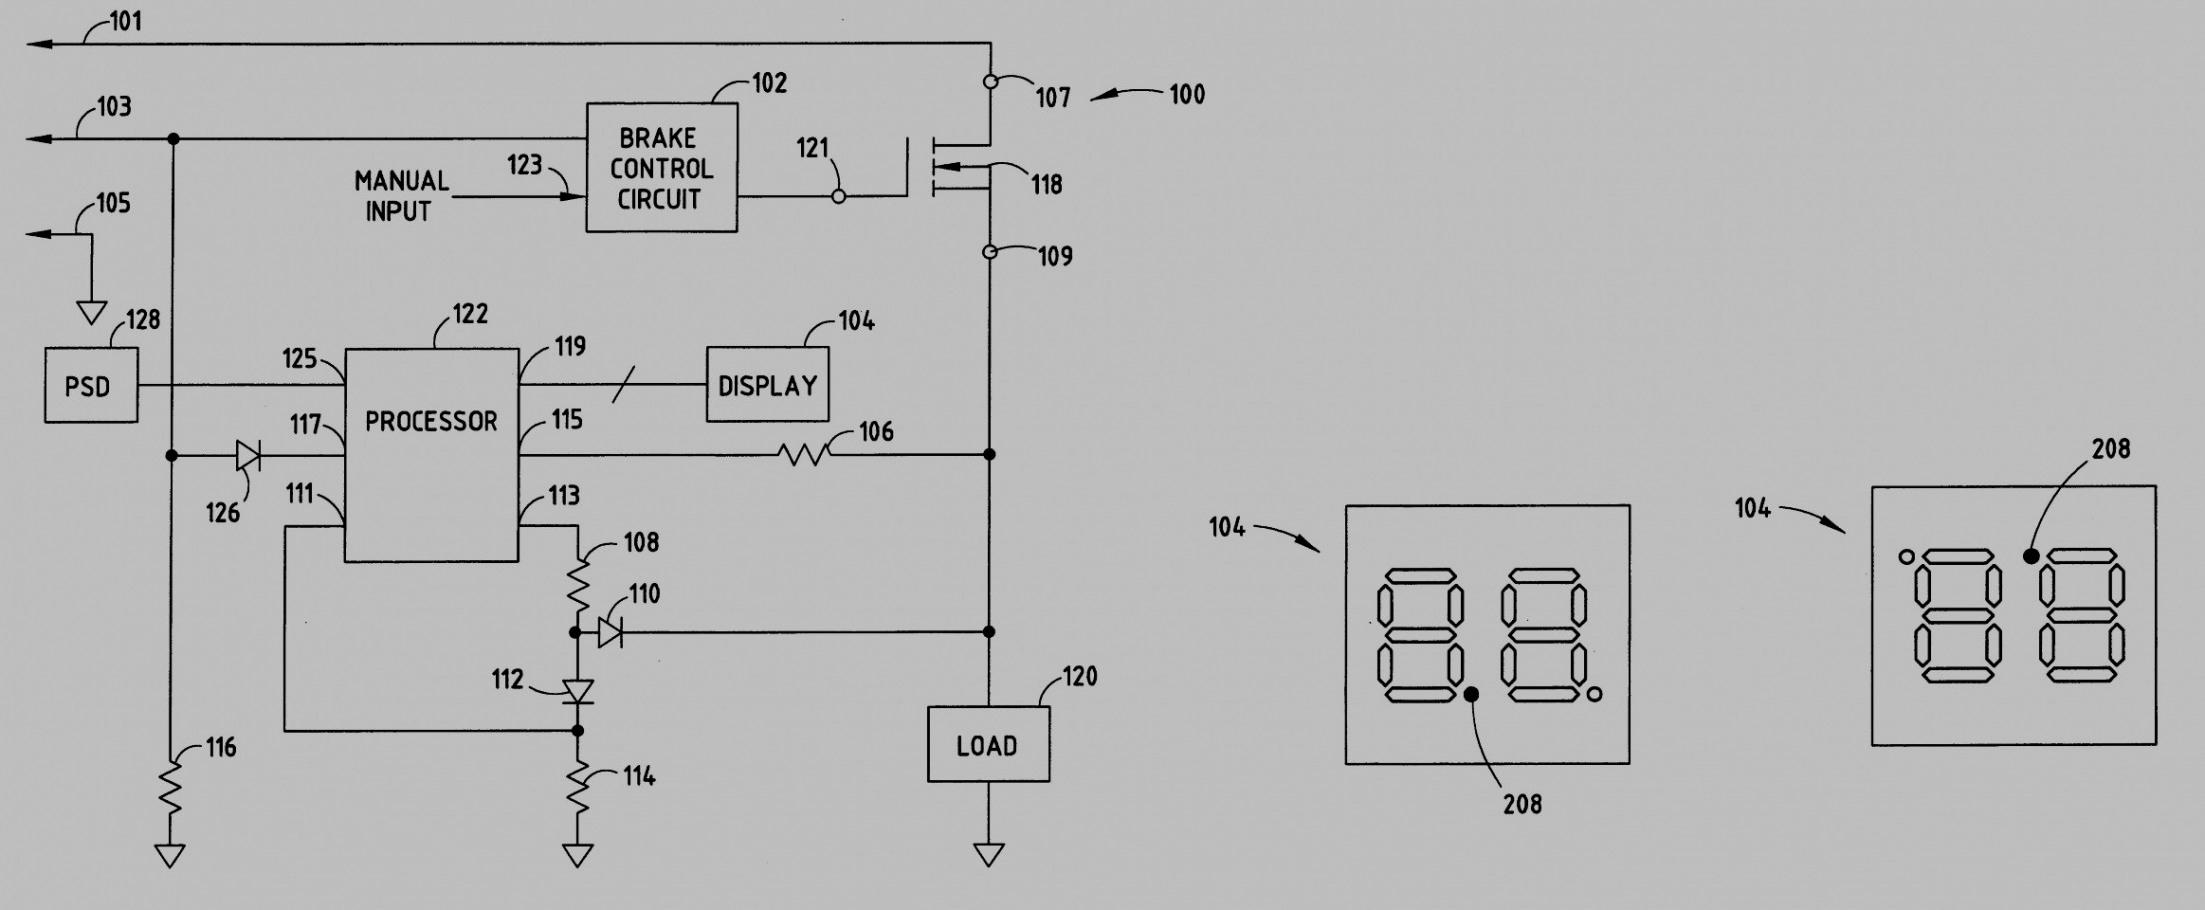 Gallery Wiring Diagram For Tekonsha Voyager Brake Controller Com - Tekonsha Voyager Wiring Diagram